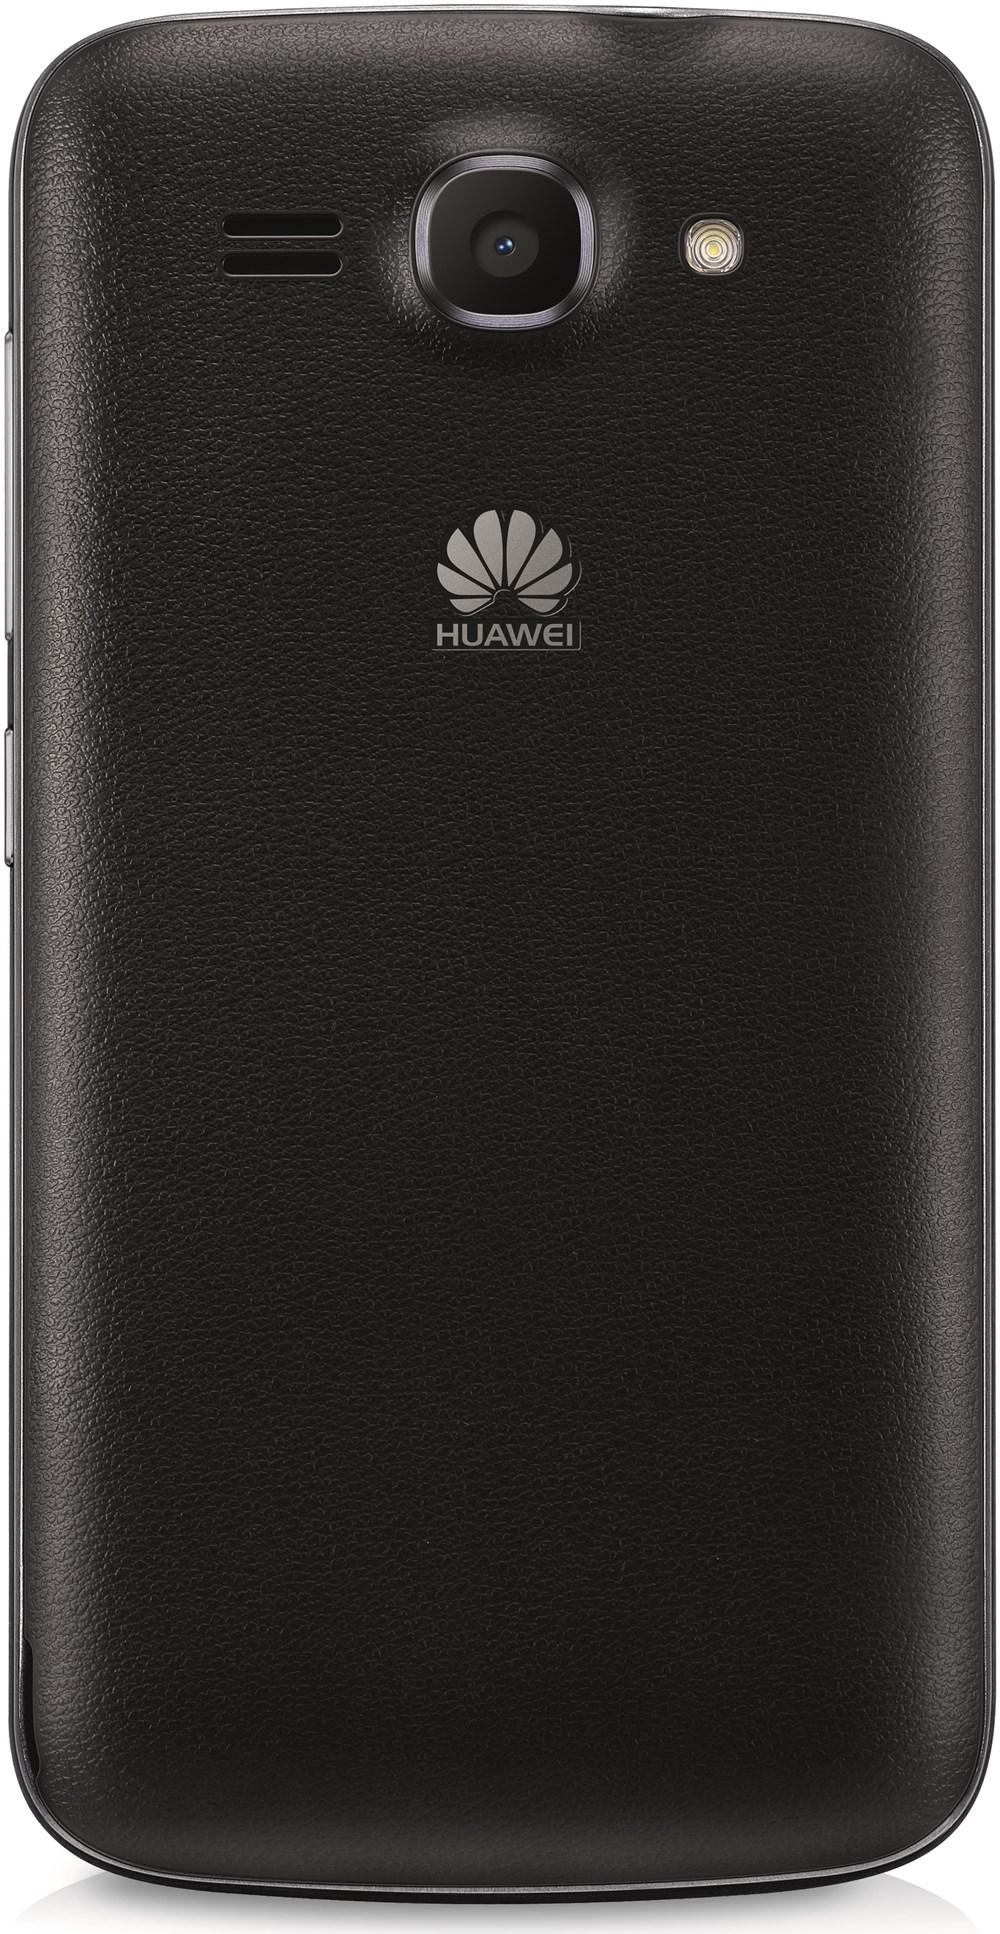 Huawei Y540  4 GB Smartphone ohne Vertrag/SIMlock,  schwarz (Handy)